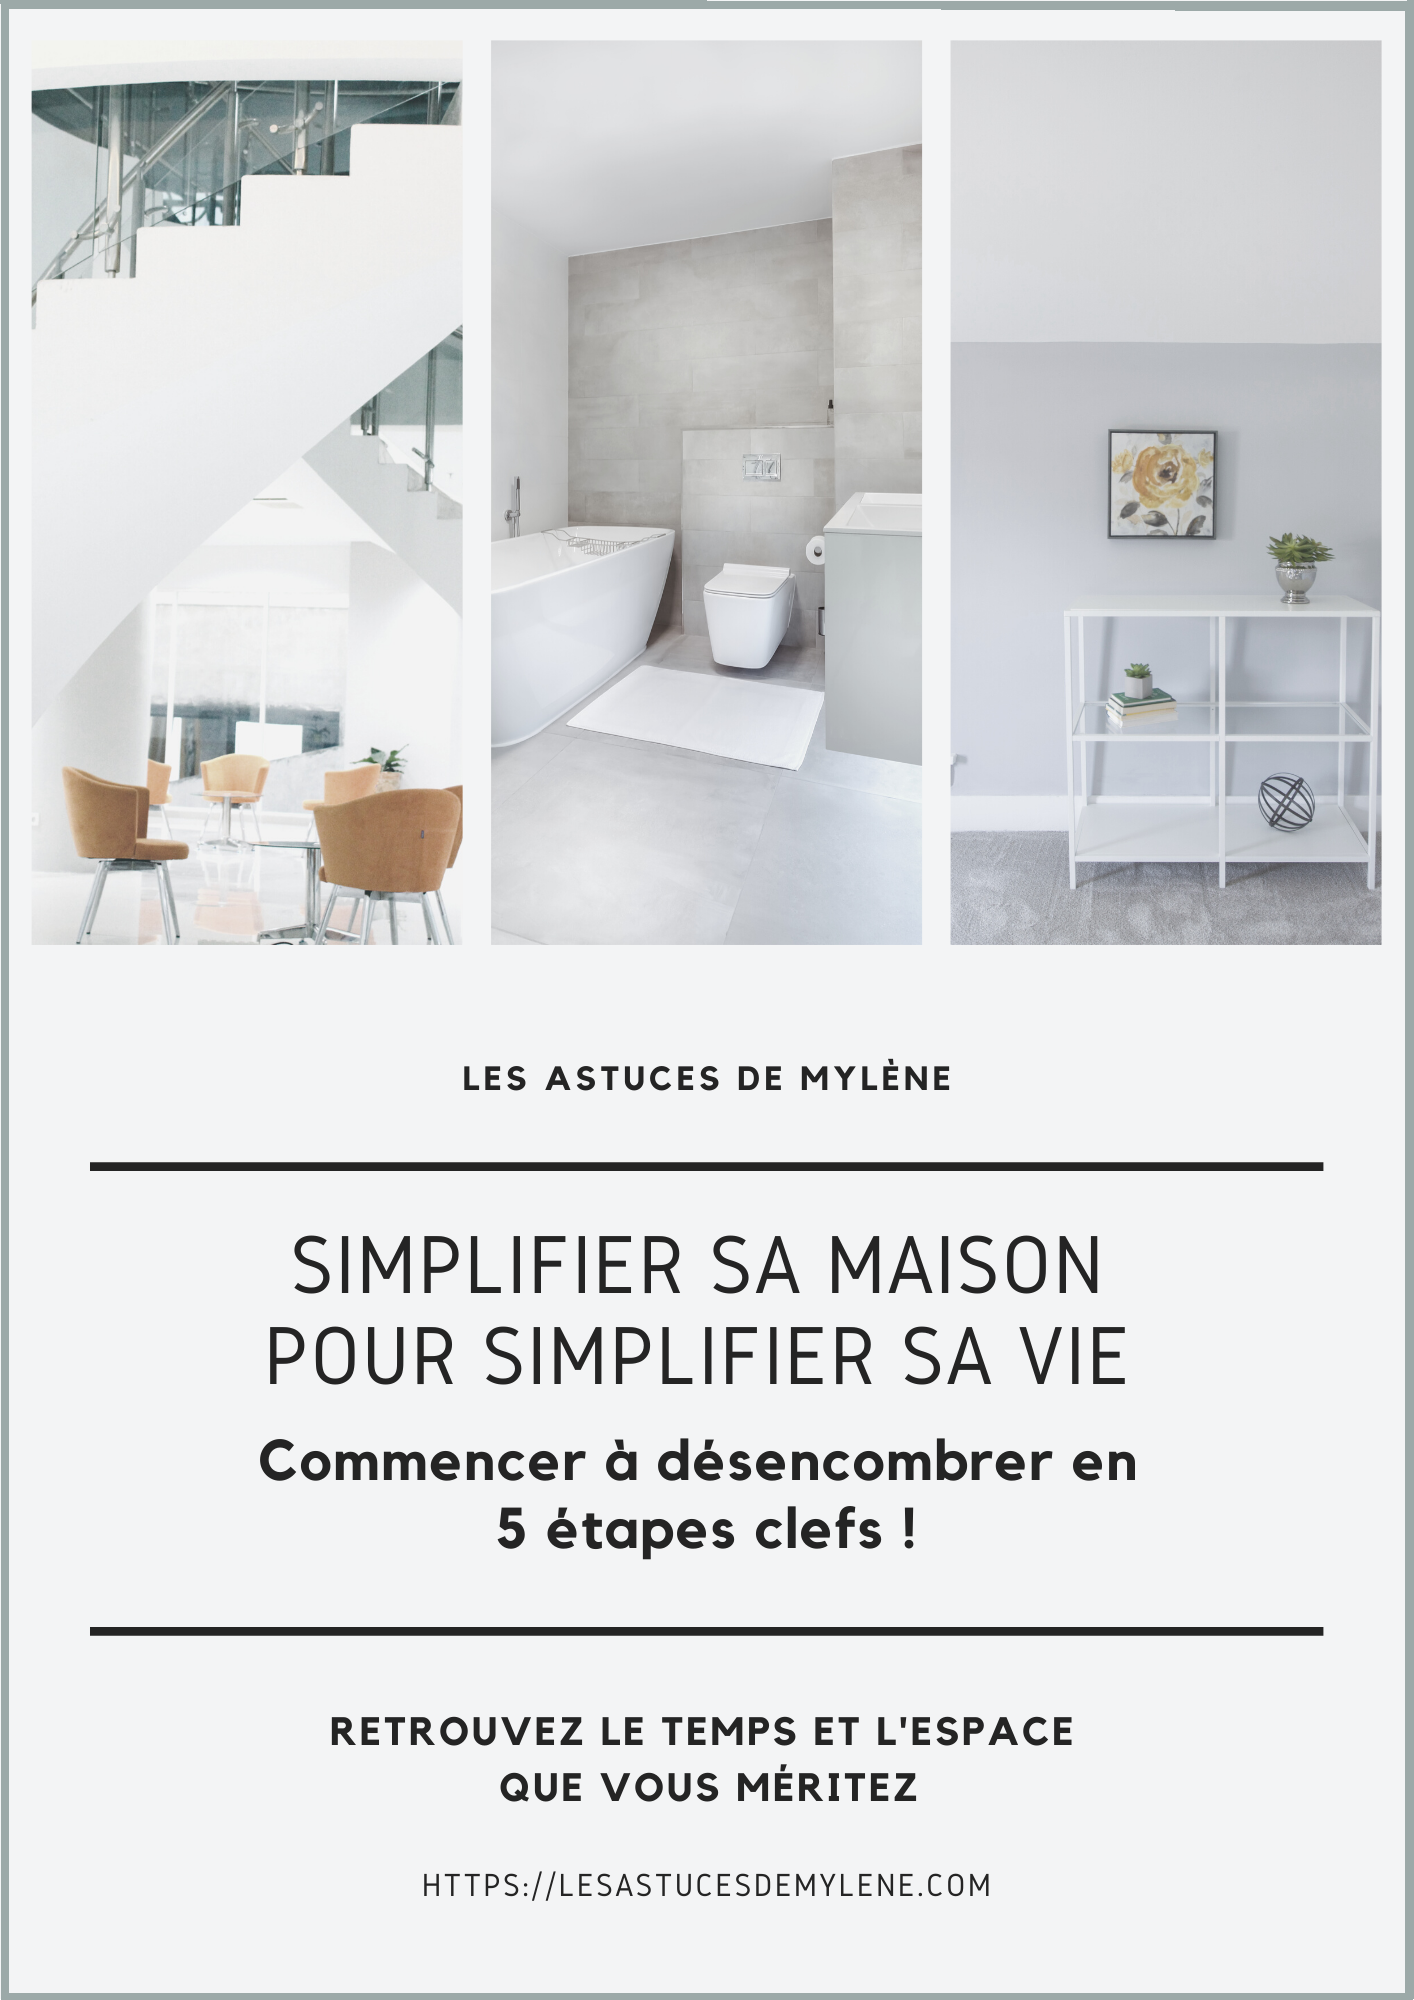 Simplifier sa maison pour simplifier sa vie